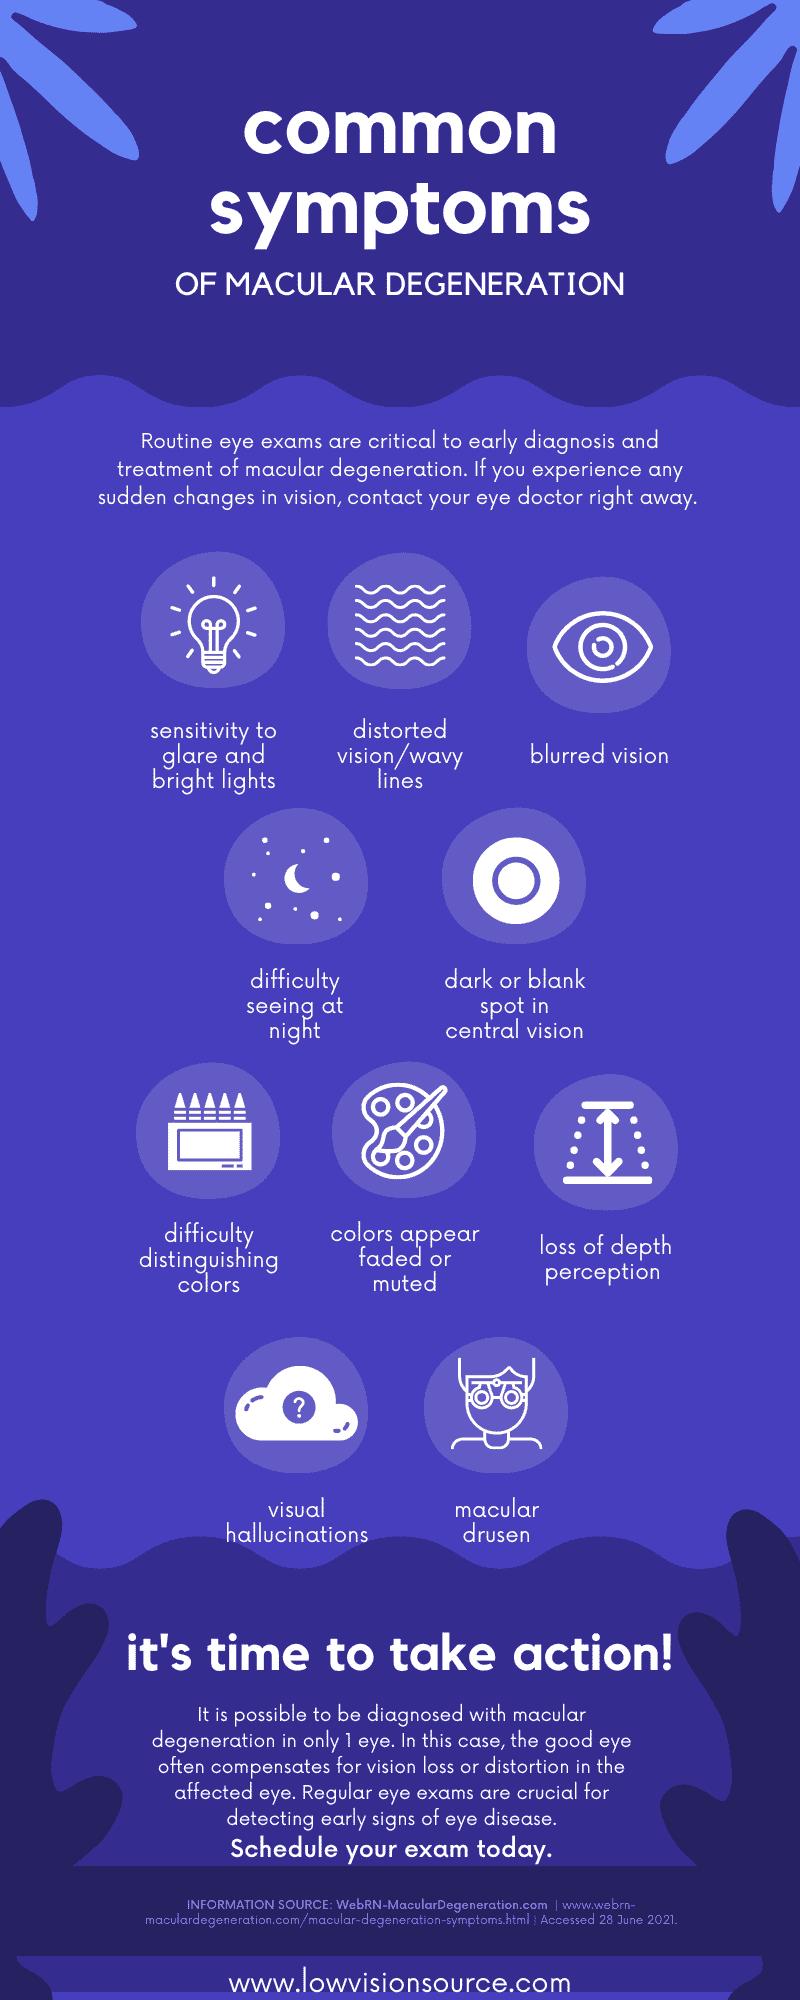 Common Symptoms of Macular Degeneration Infographic